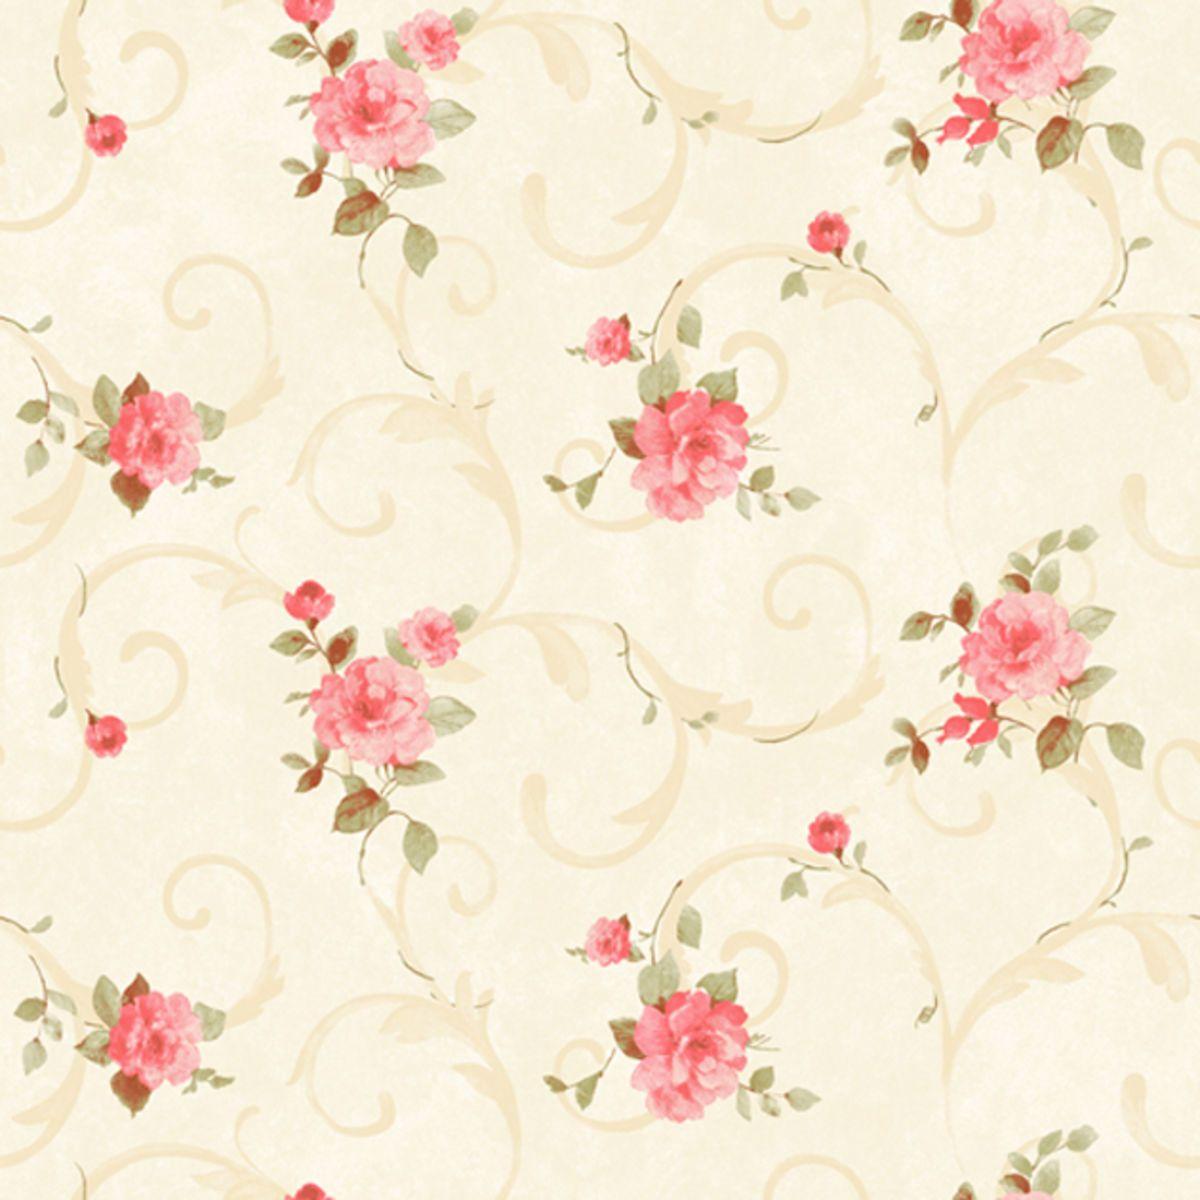 Papel De Parede Floral Com Glitter Lavvel 20141003160908 Wallpaper